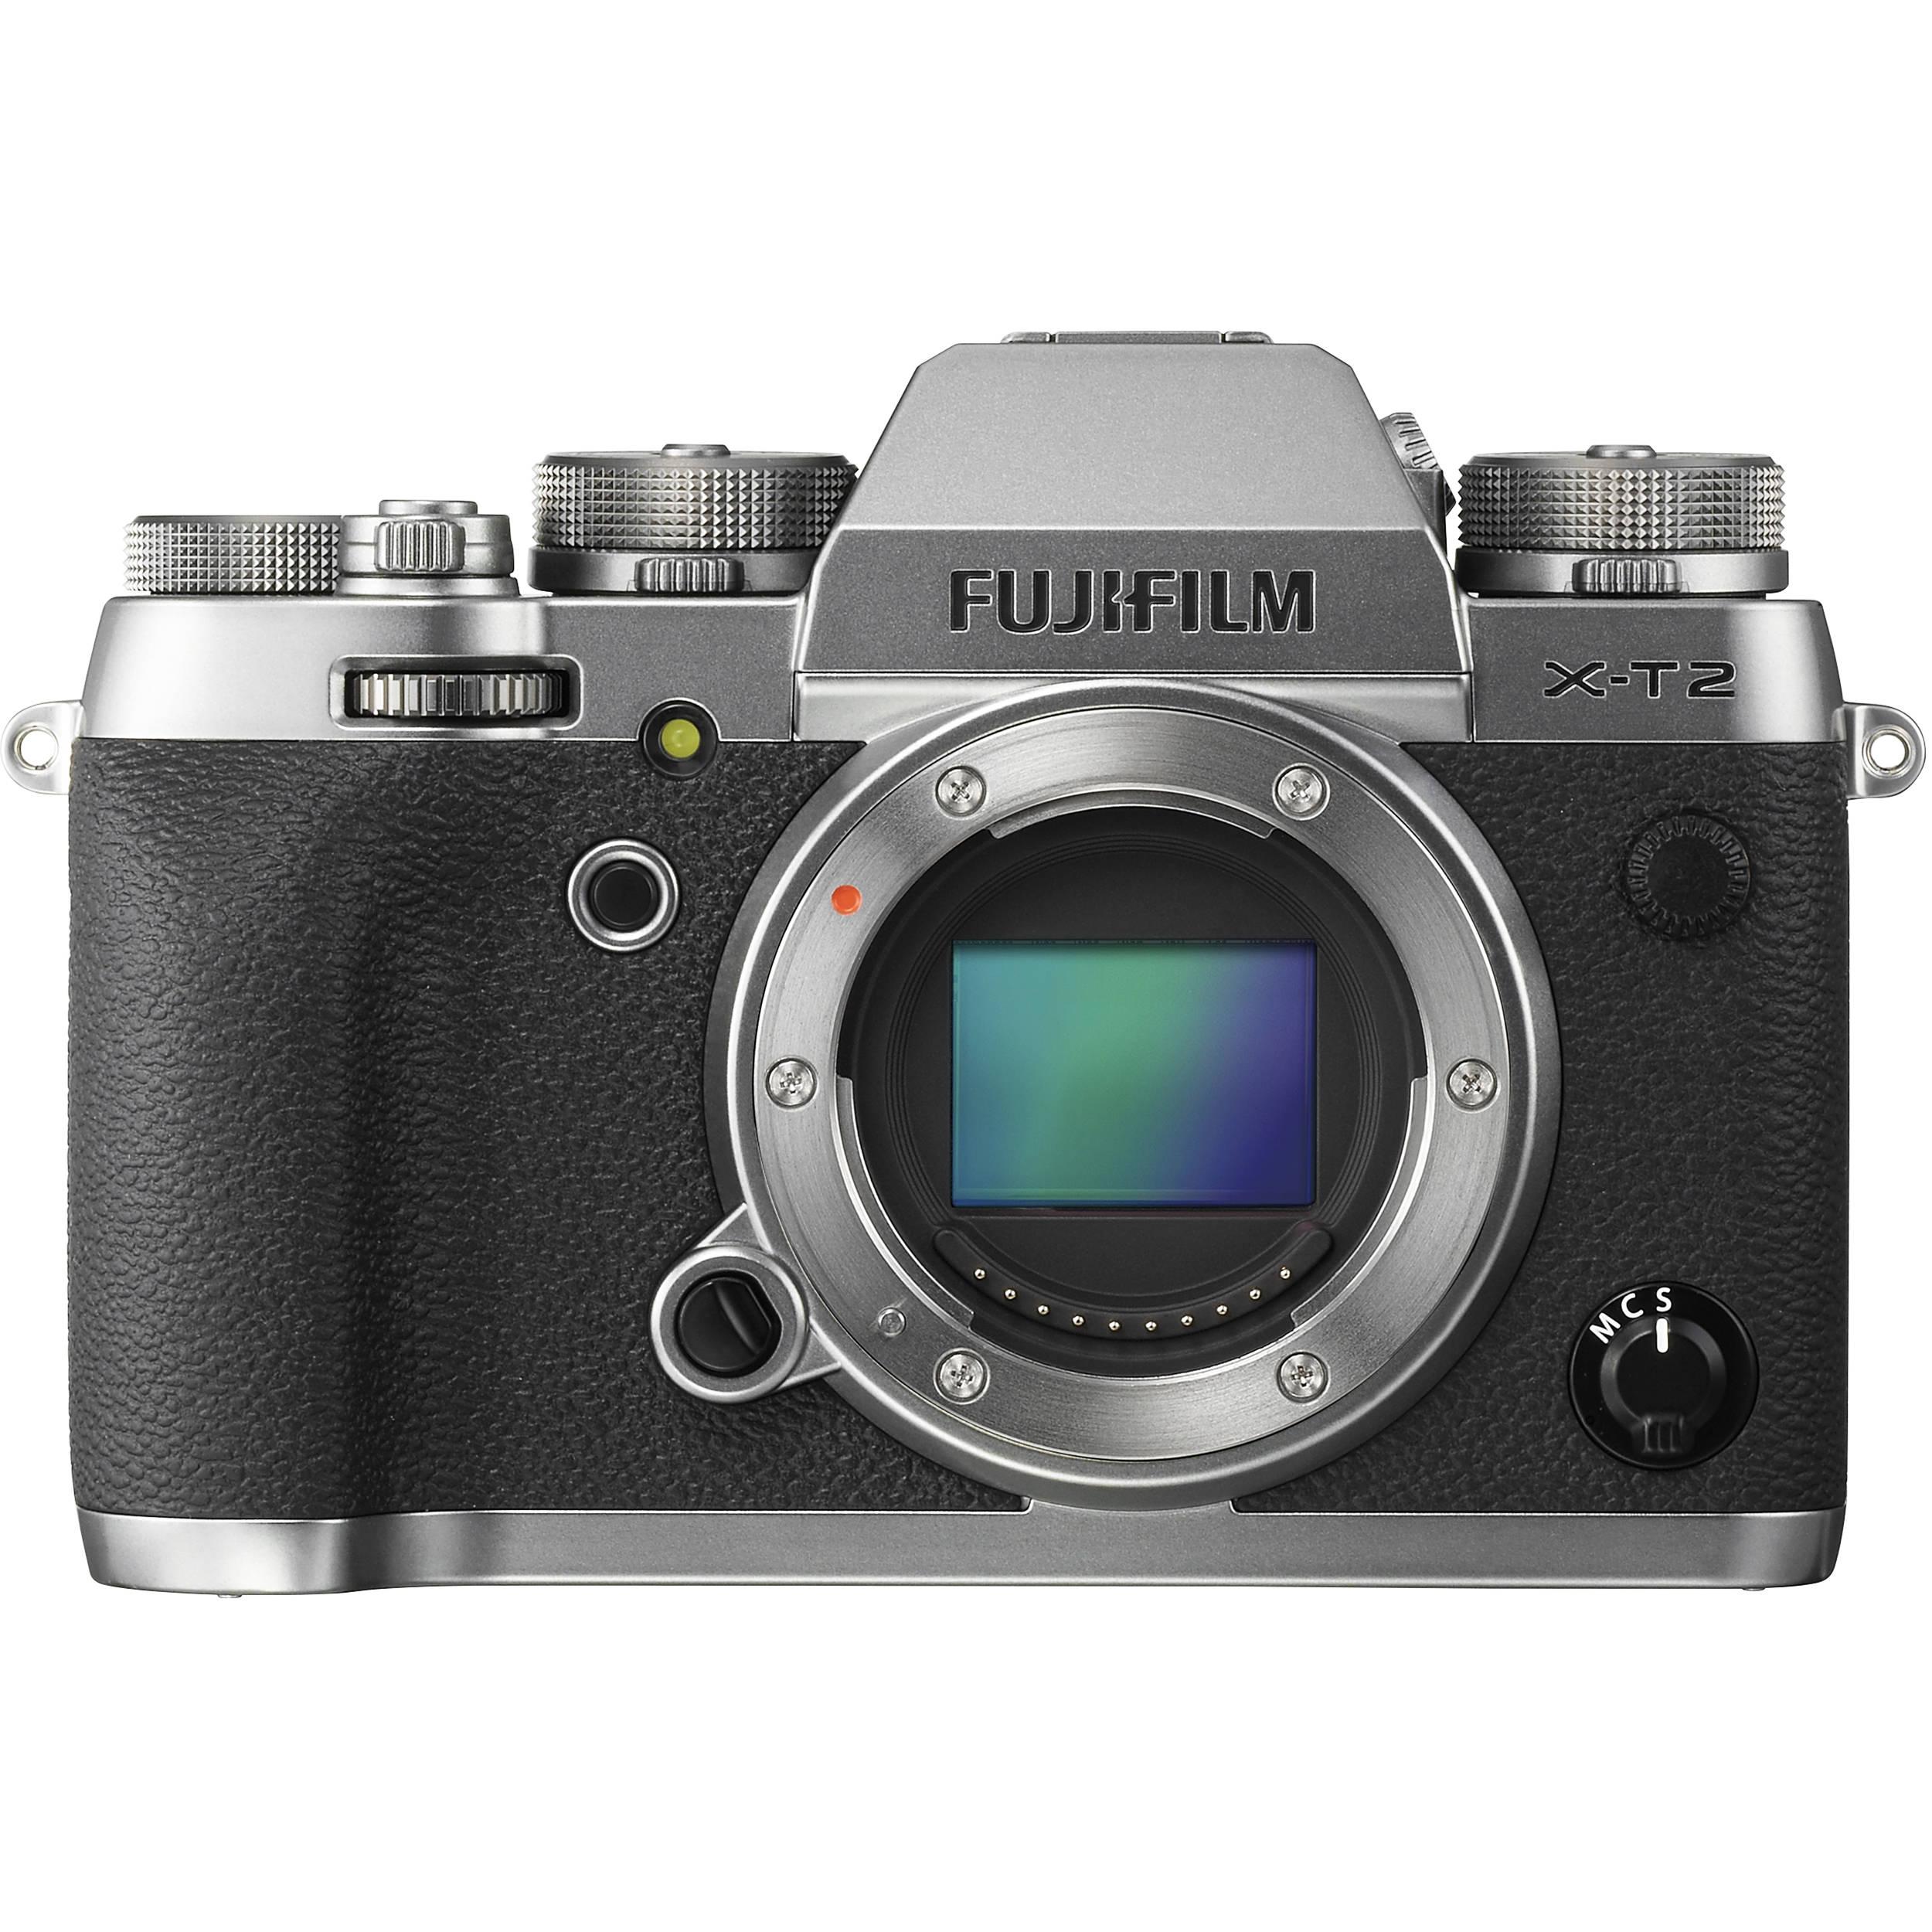 Foto & Camcorder Auflösung Fotogeschäft #075 Fujifilm Instant Camera Piano Black Instax Mini 50s Analogkameras